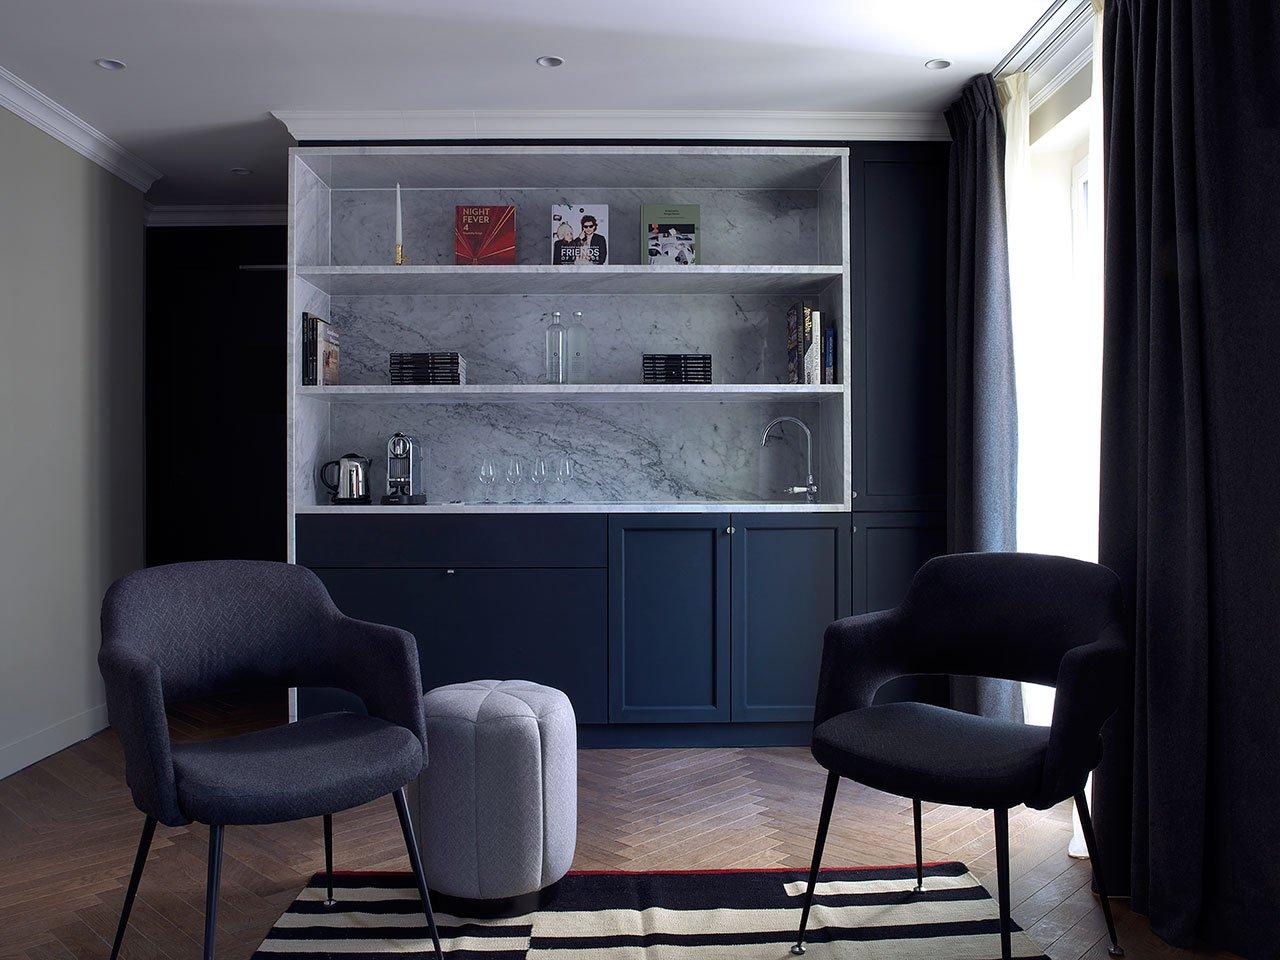 f9_hotel_bachaumont_paris_photo_paul_bowyer_yatzer